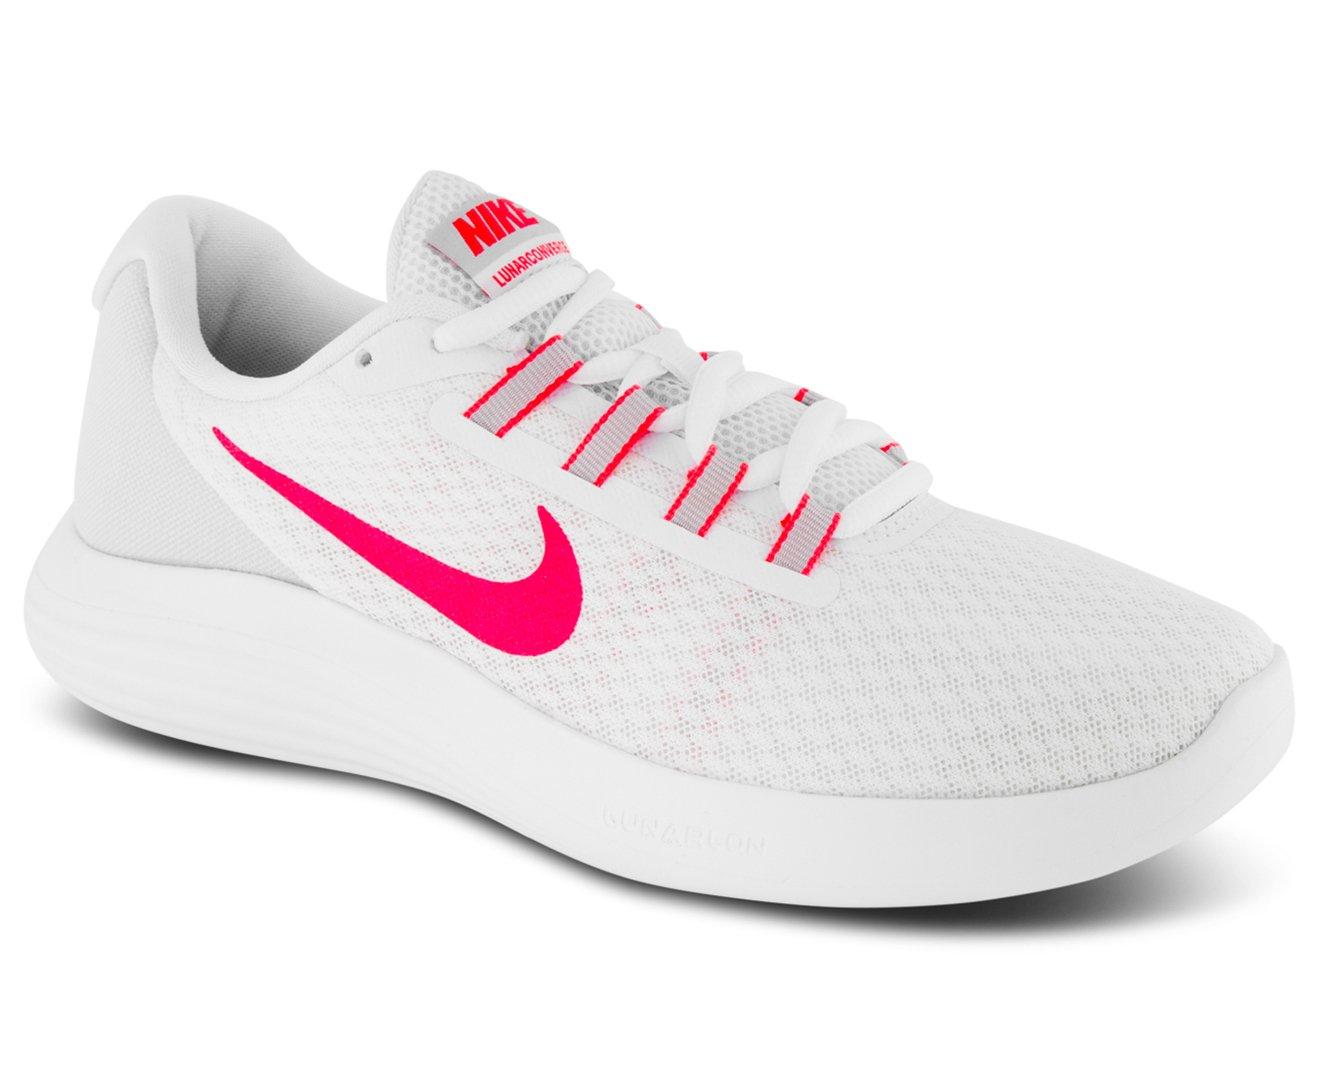 Nike Nike Nike Damen WMNS Lunarconverge Laufschuhe B07D5MJQ1C Neutral- und Straßenlaufschuhe Clever und praktisch fbb2ac